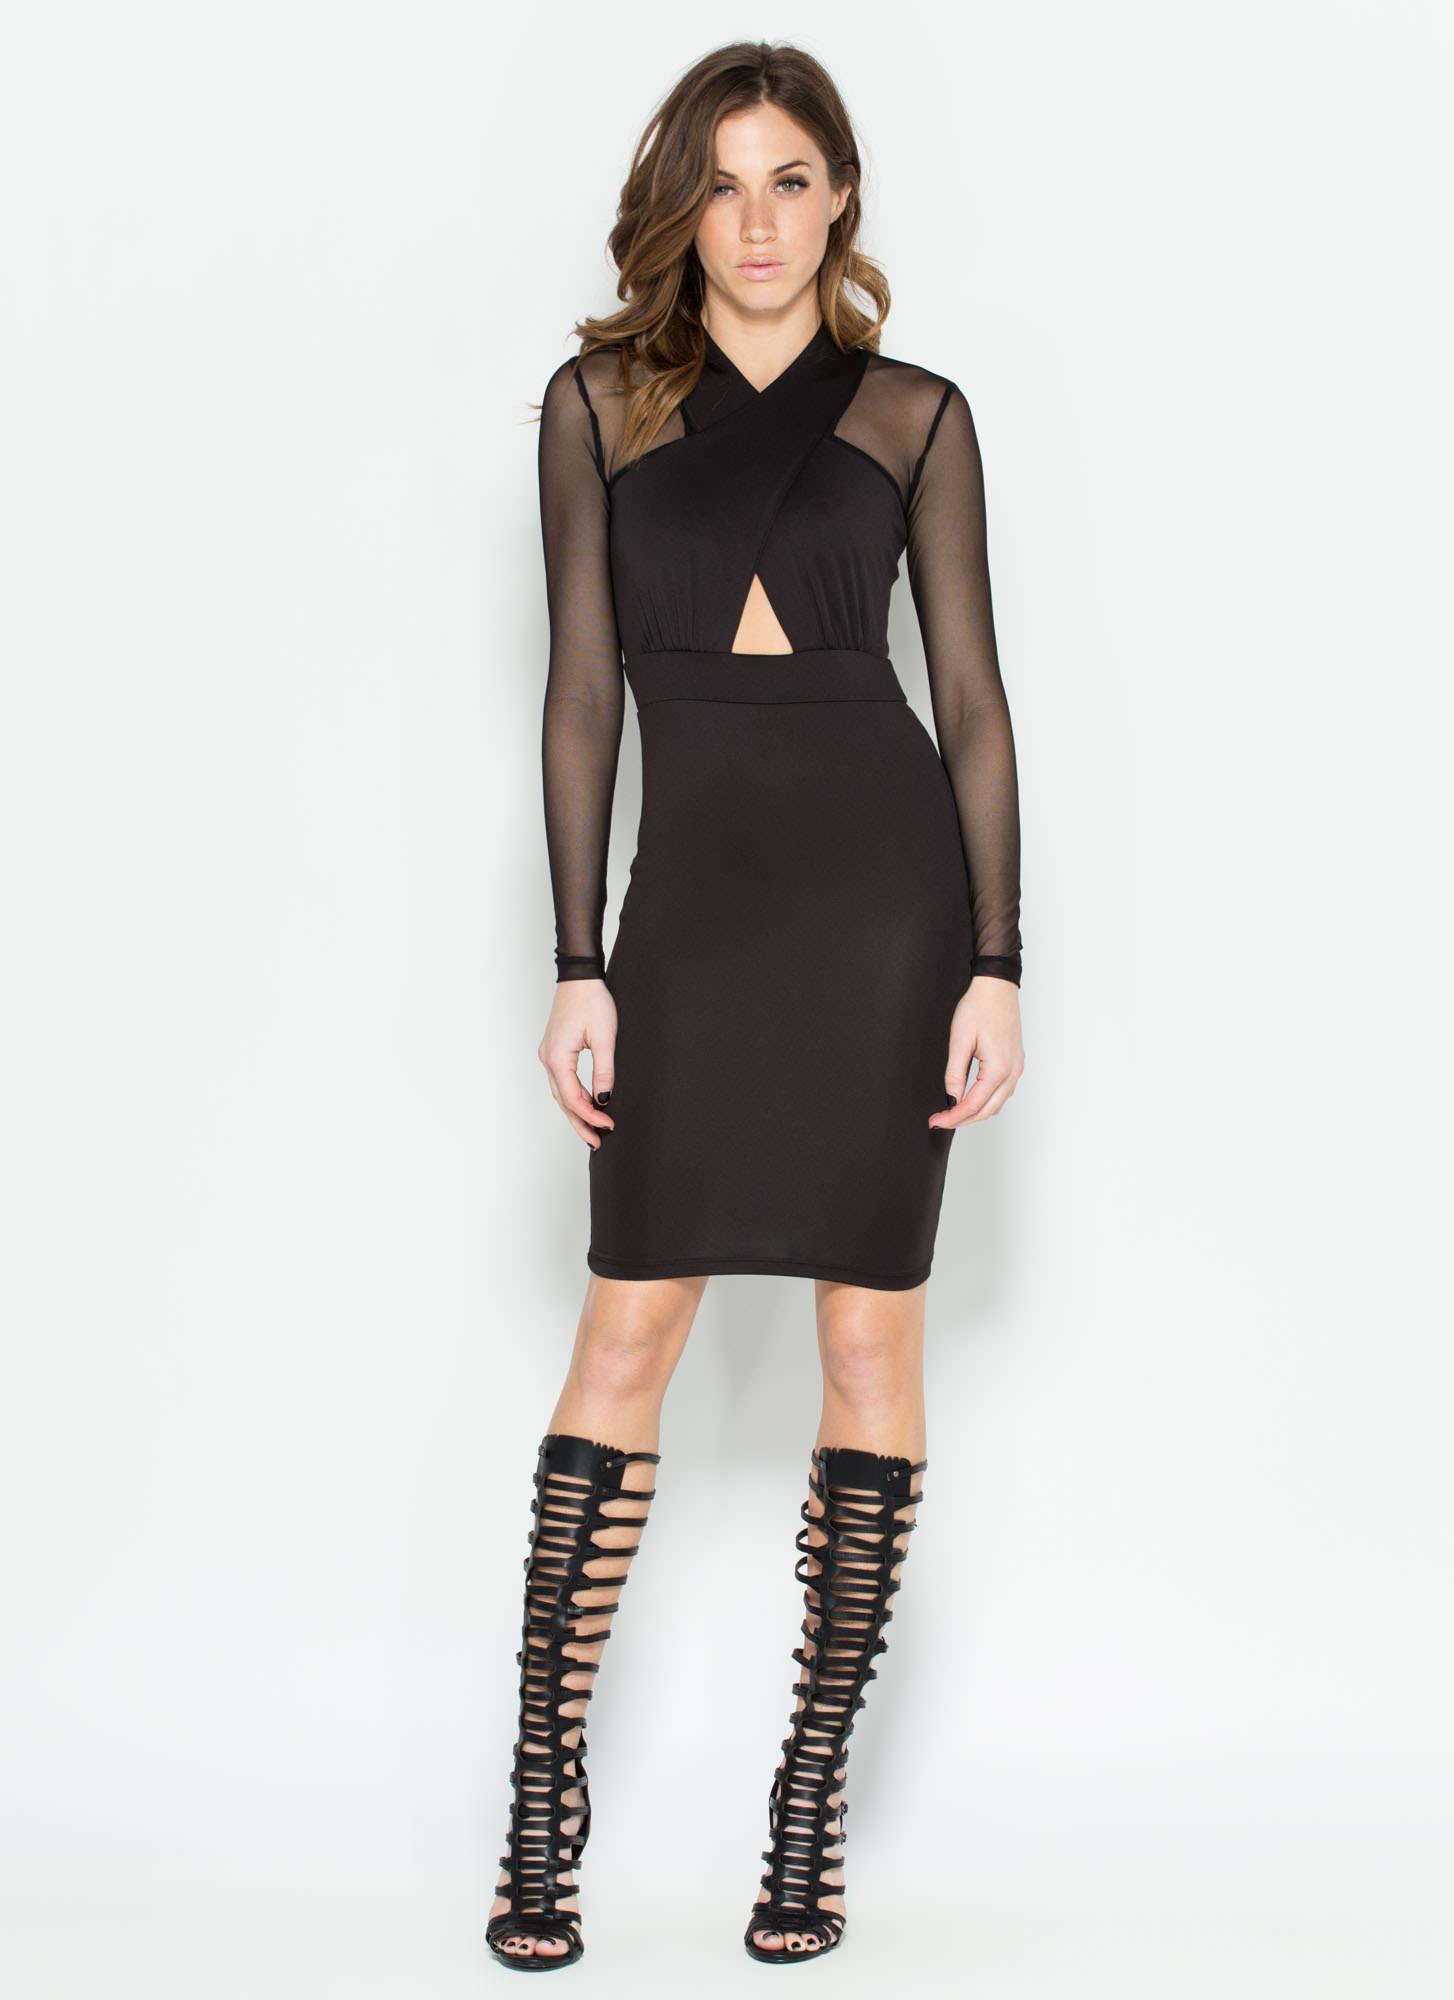 Thing Bodycon Dress BLACK - GoJane.com